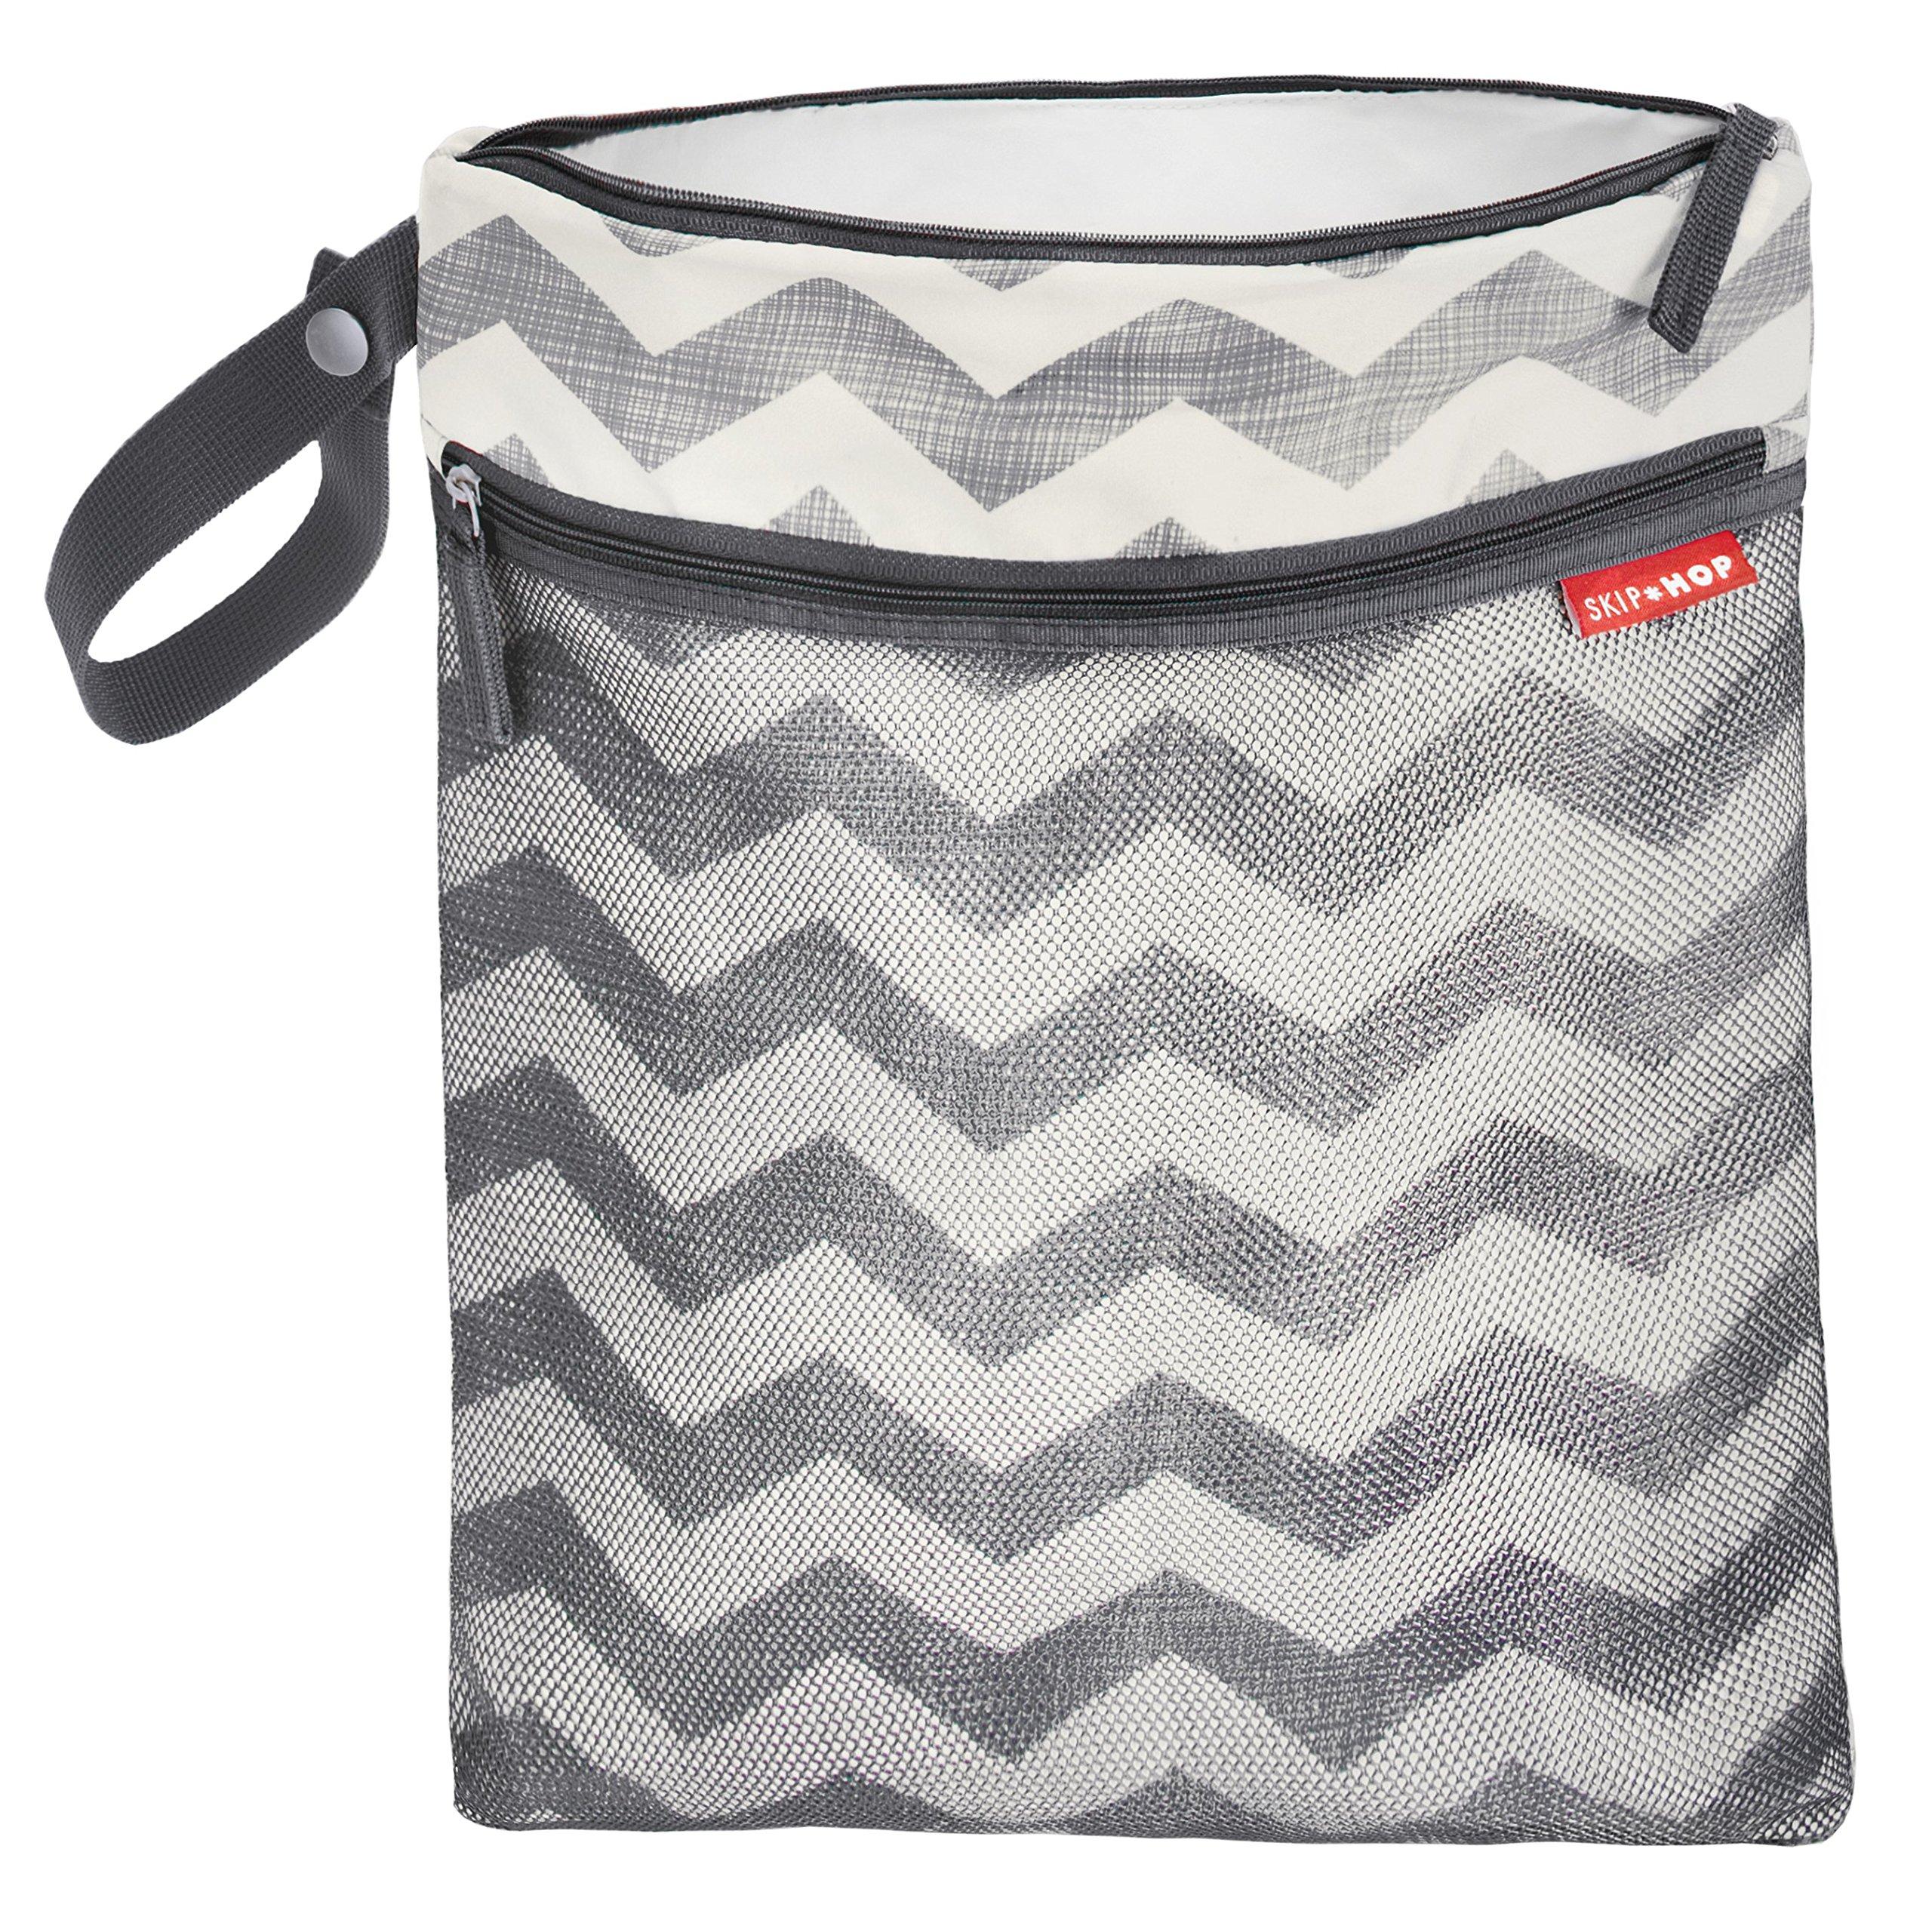 Skip Hop Grab and Go Wet/Dry Diaper Bag, Chevron